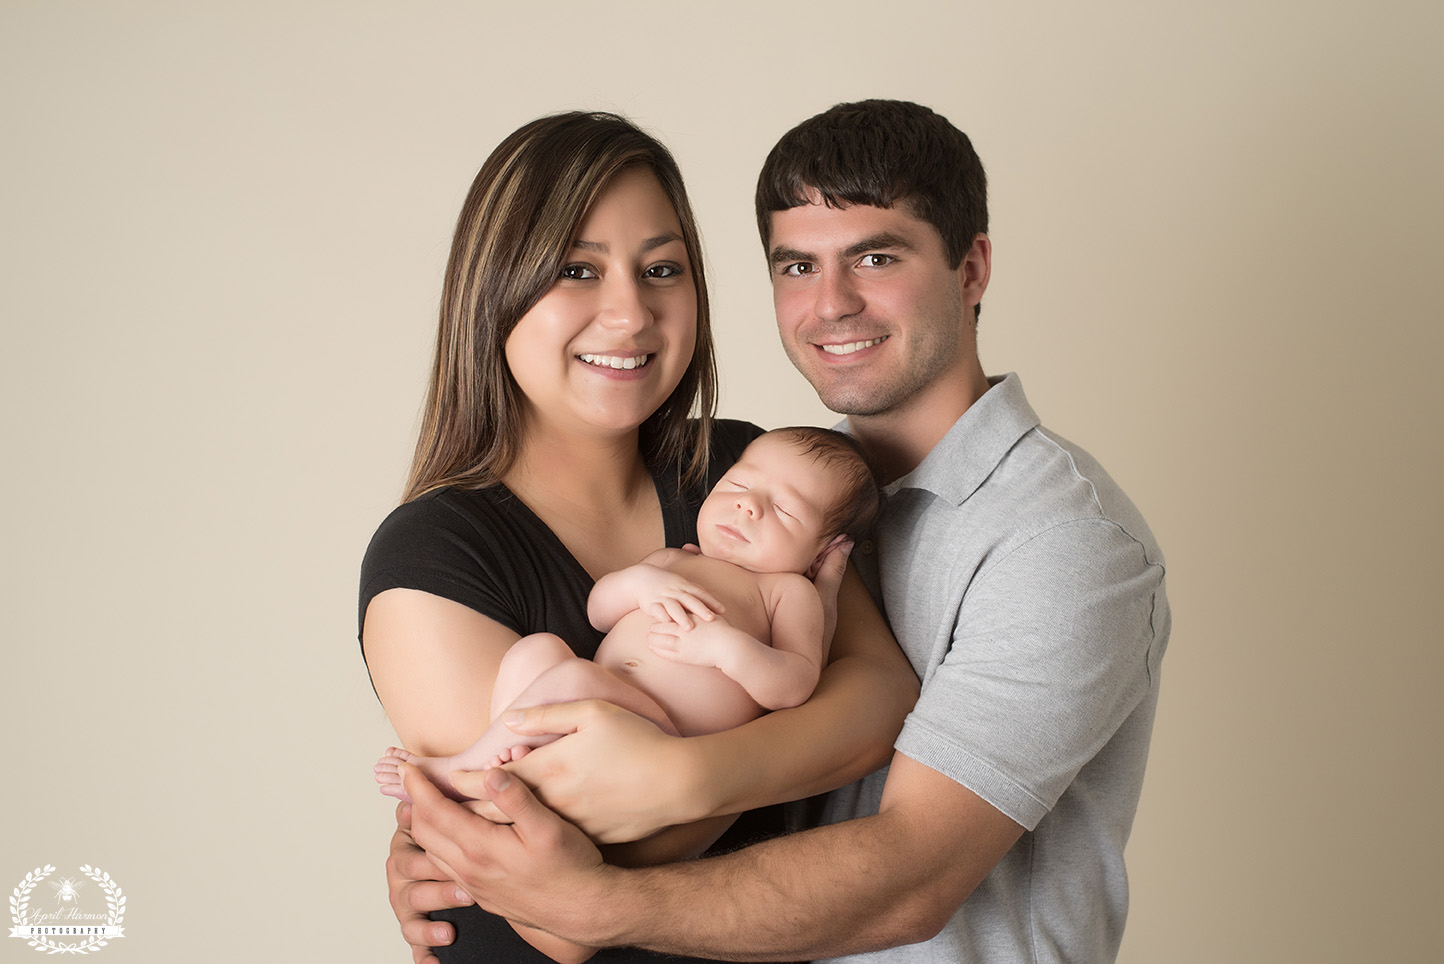 newborn-photography-southwest-ks-2.jpg